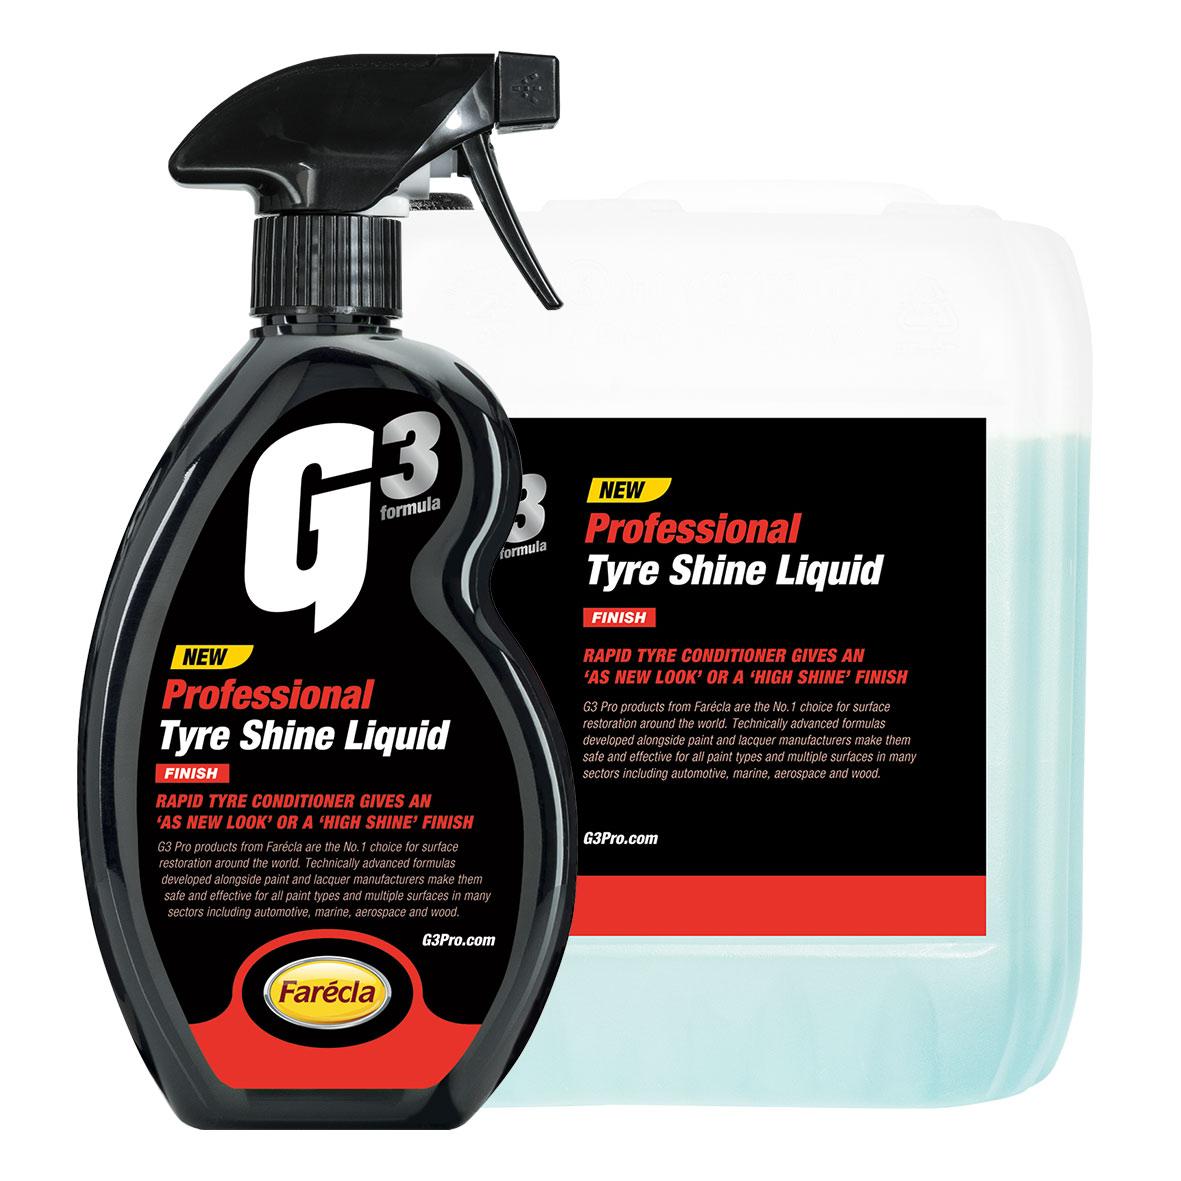 G3 Pro Tyre Shine Liquid